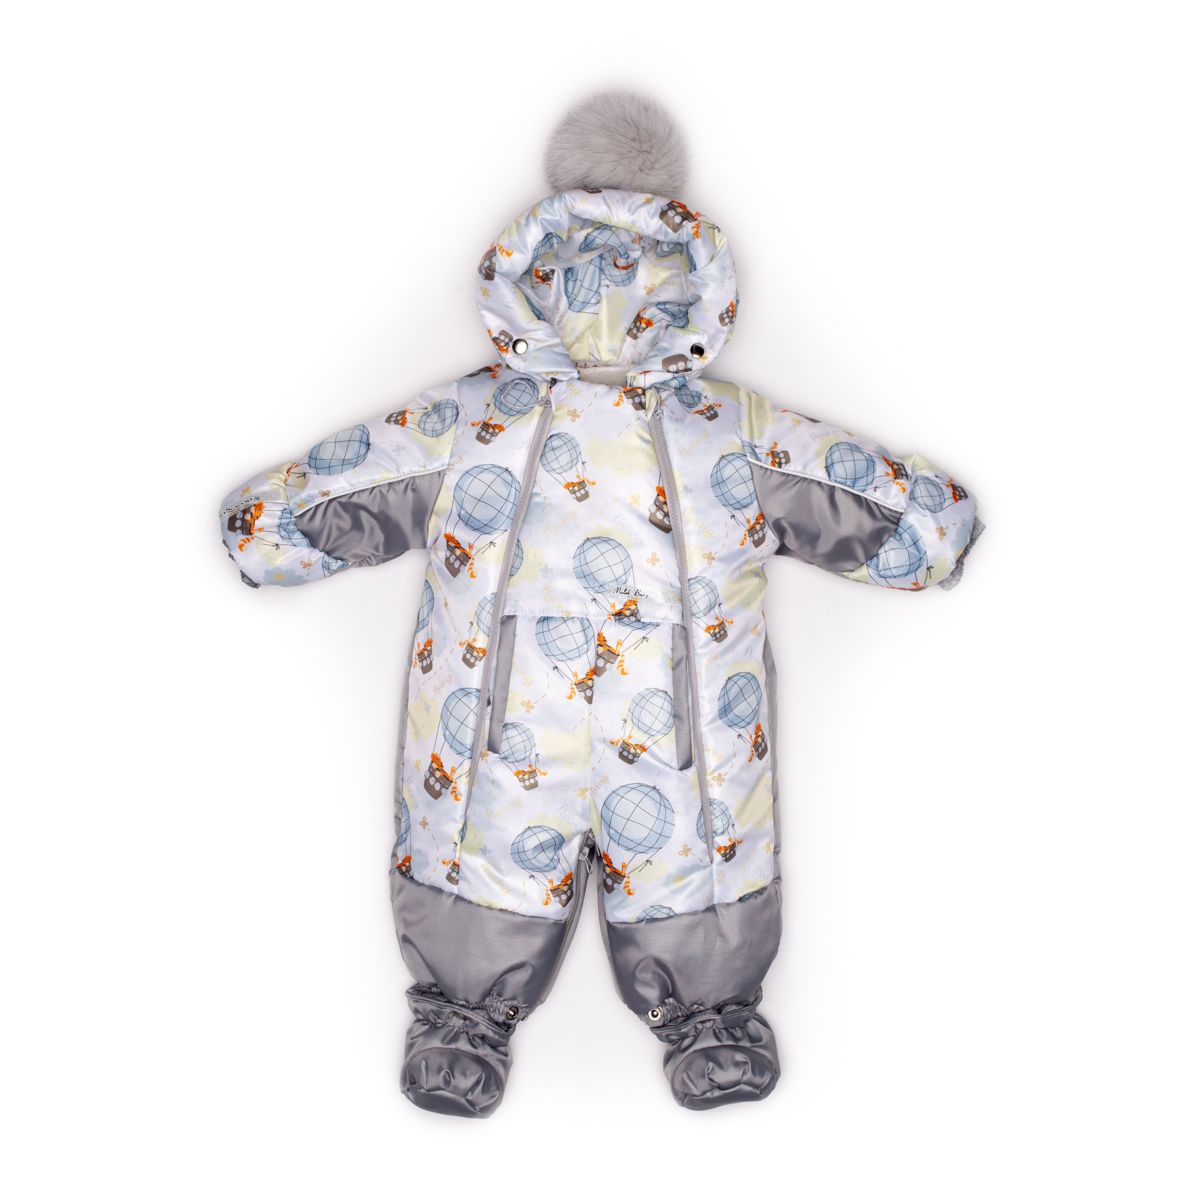 Купить 145шм/1, Комбинезон Malek Baby трансформер, цвет: серый/голубой р.68, Malek-Baby,